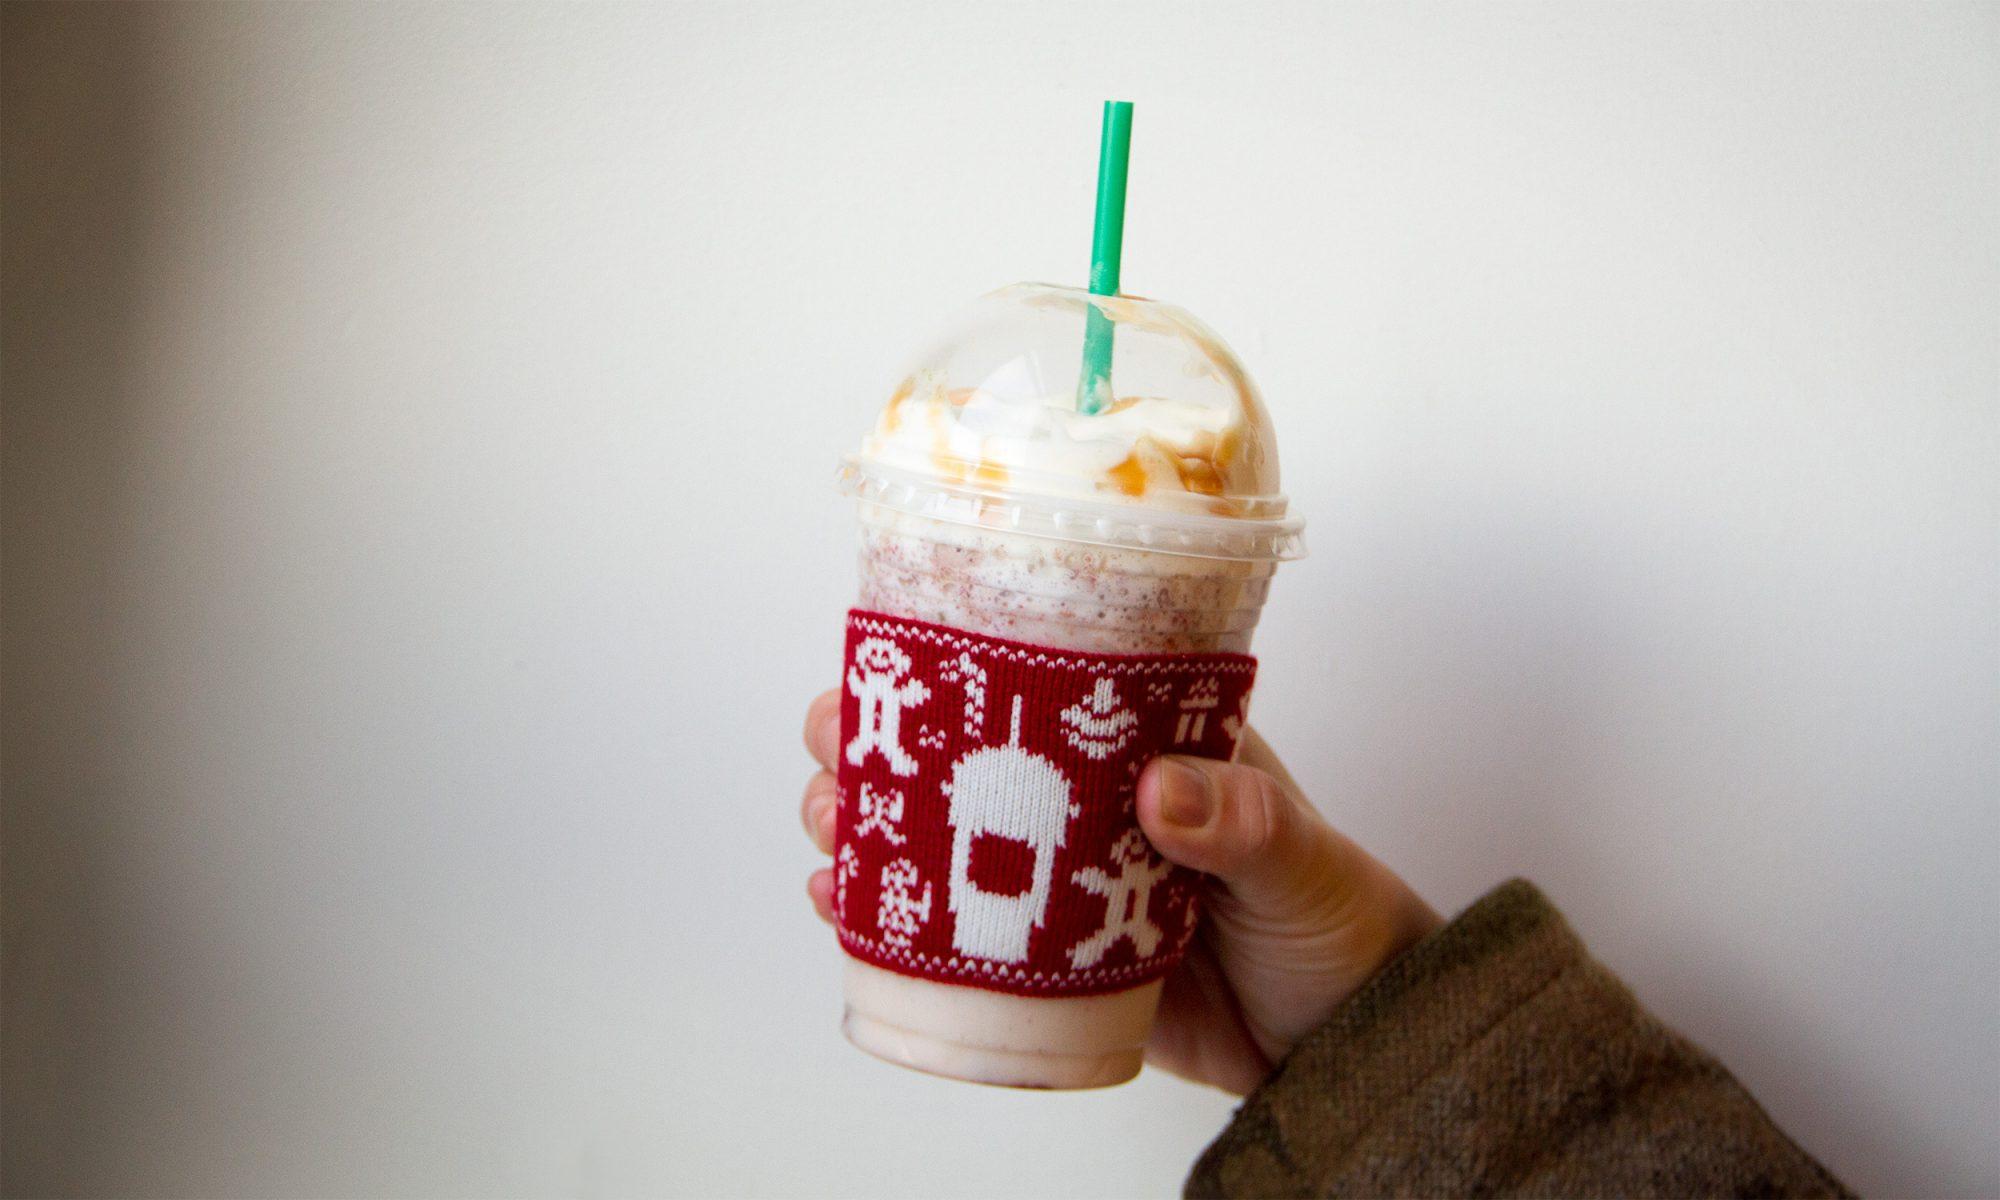 Starbucks' Fruitcake Frappuccino